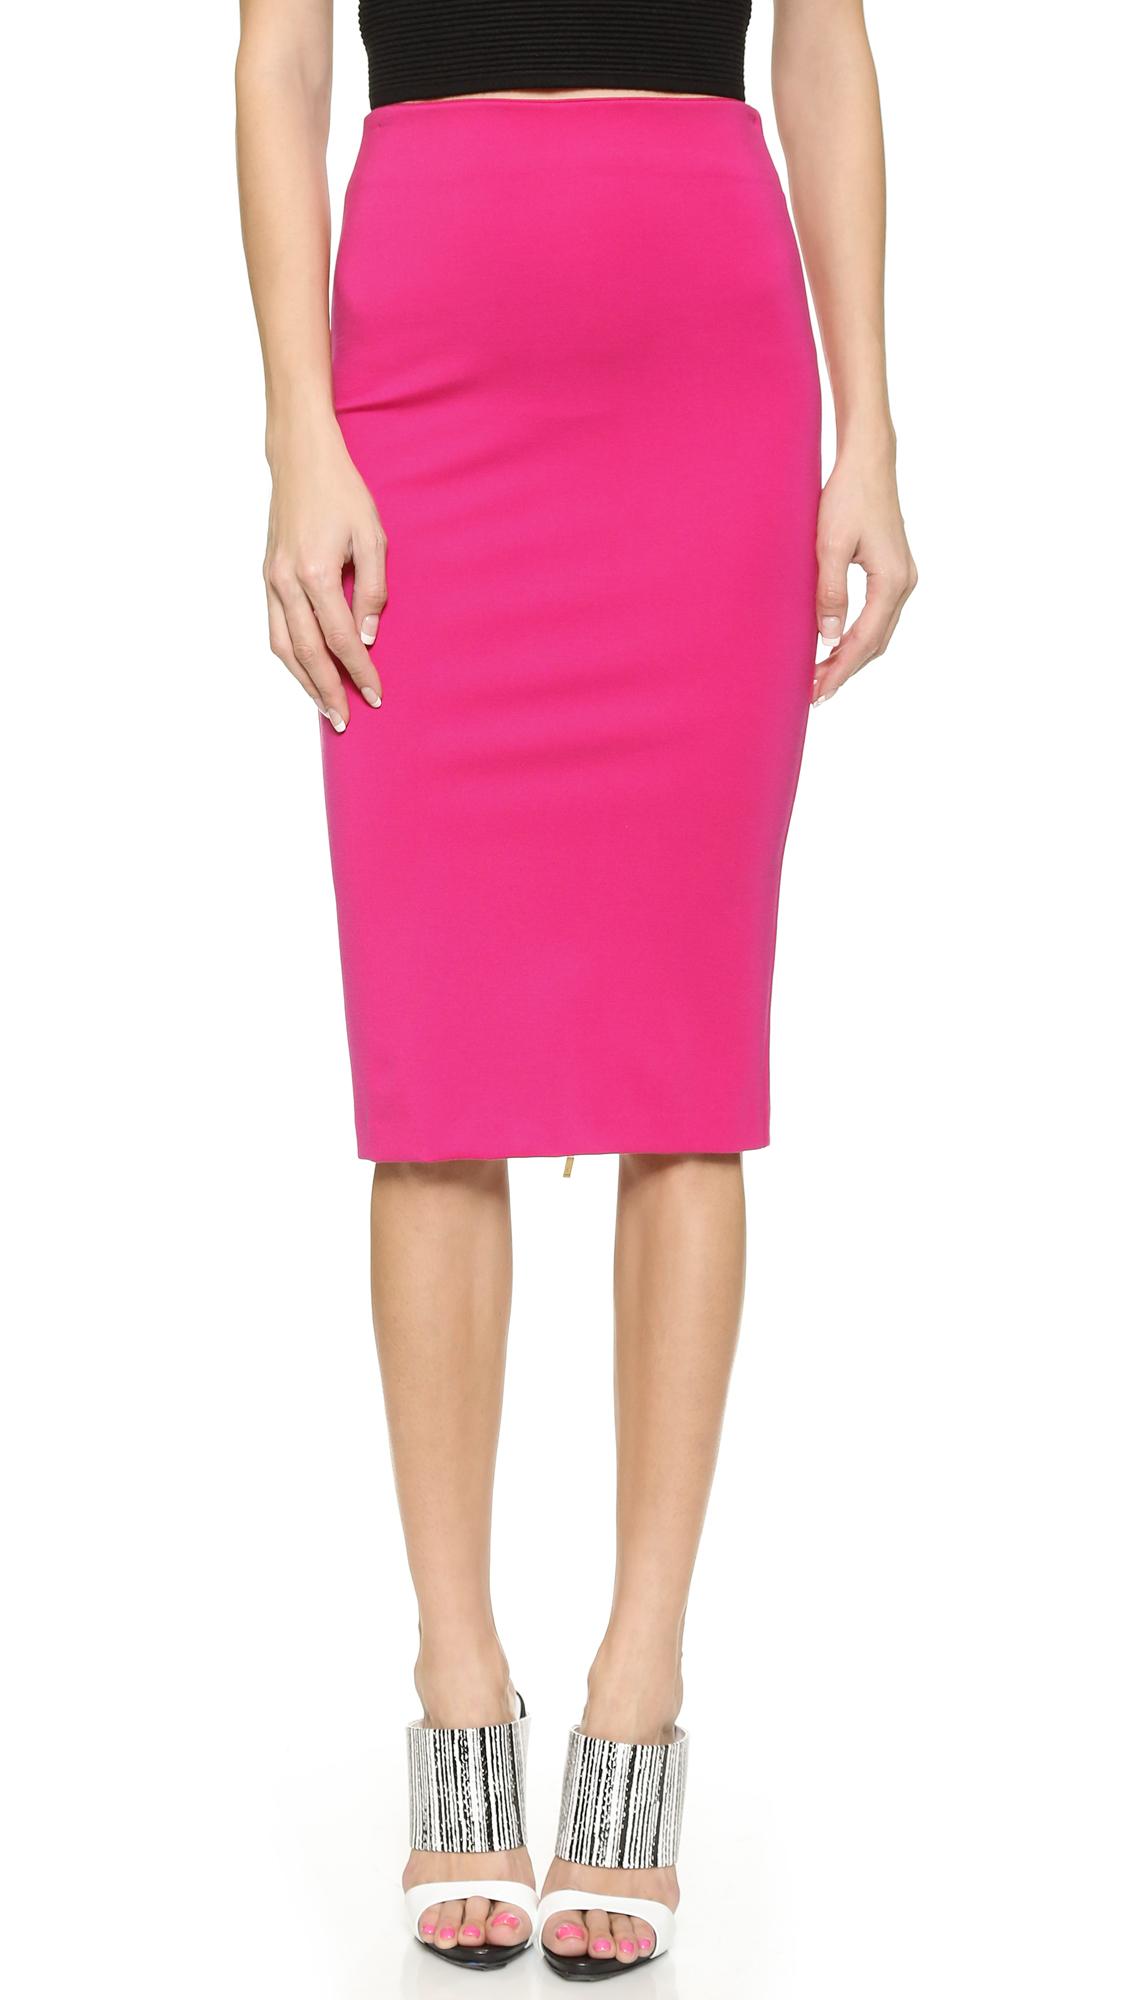 6019c7b6a7 5Th & Mercer Pencil Skirt in Pink - Lyst